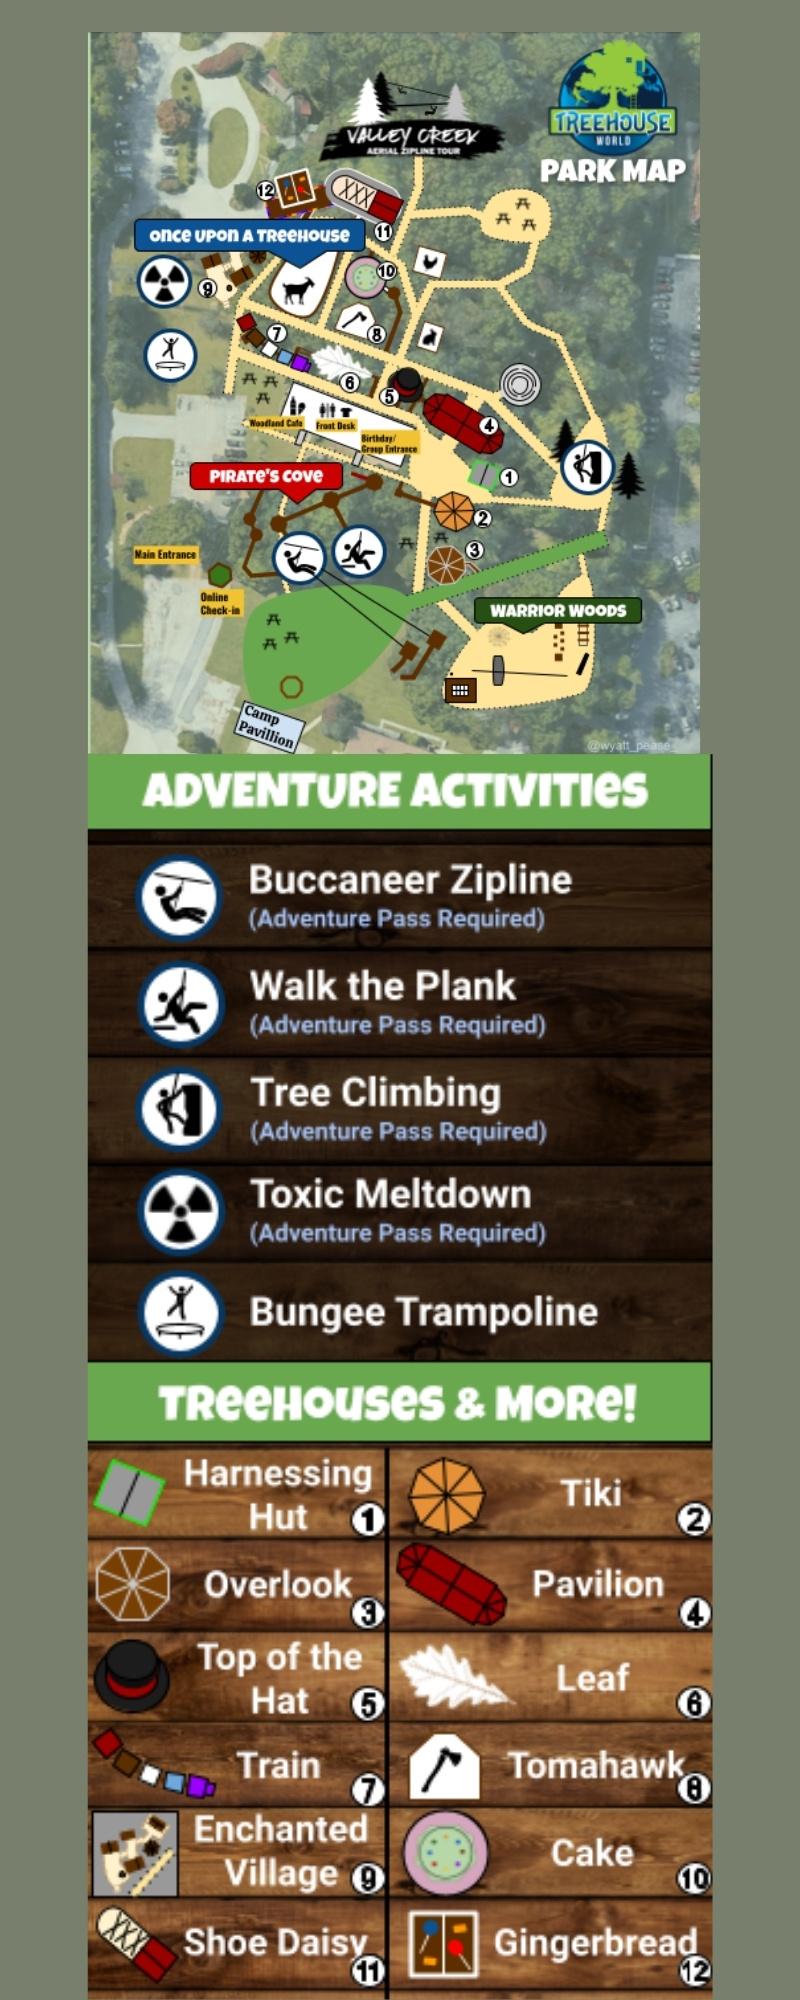 Treehouse World Adventure Park Map